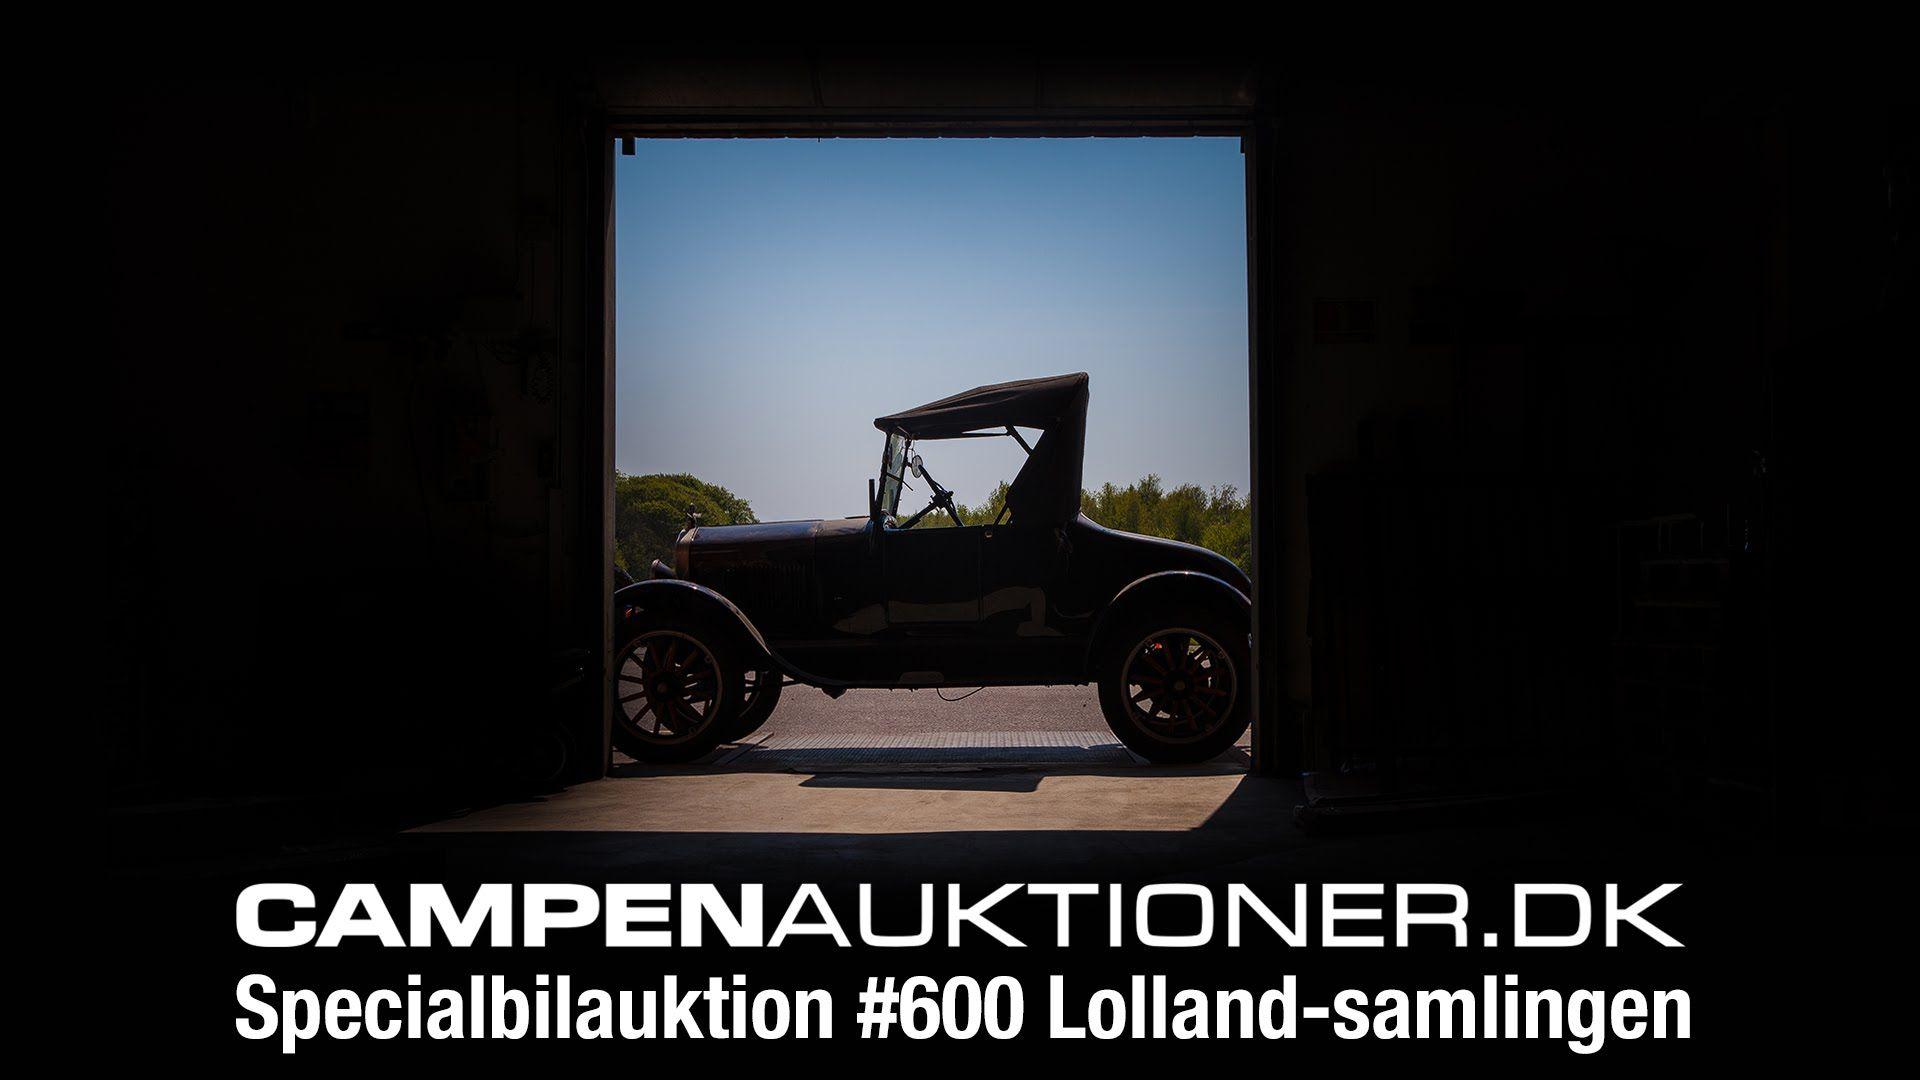 Campen Auktioner A/S - Specialbilauktion #600, Lollands-samlingen